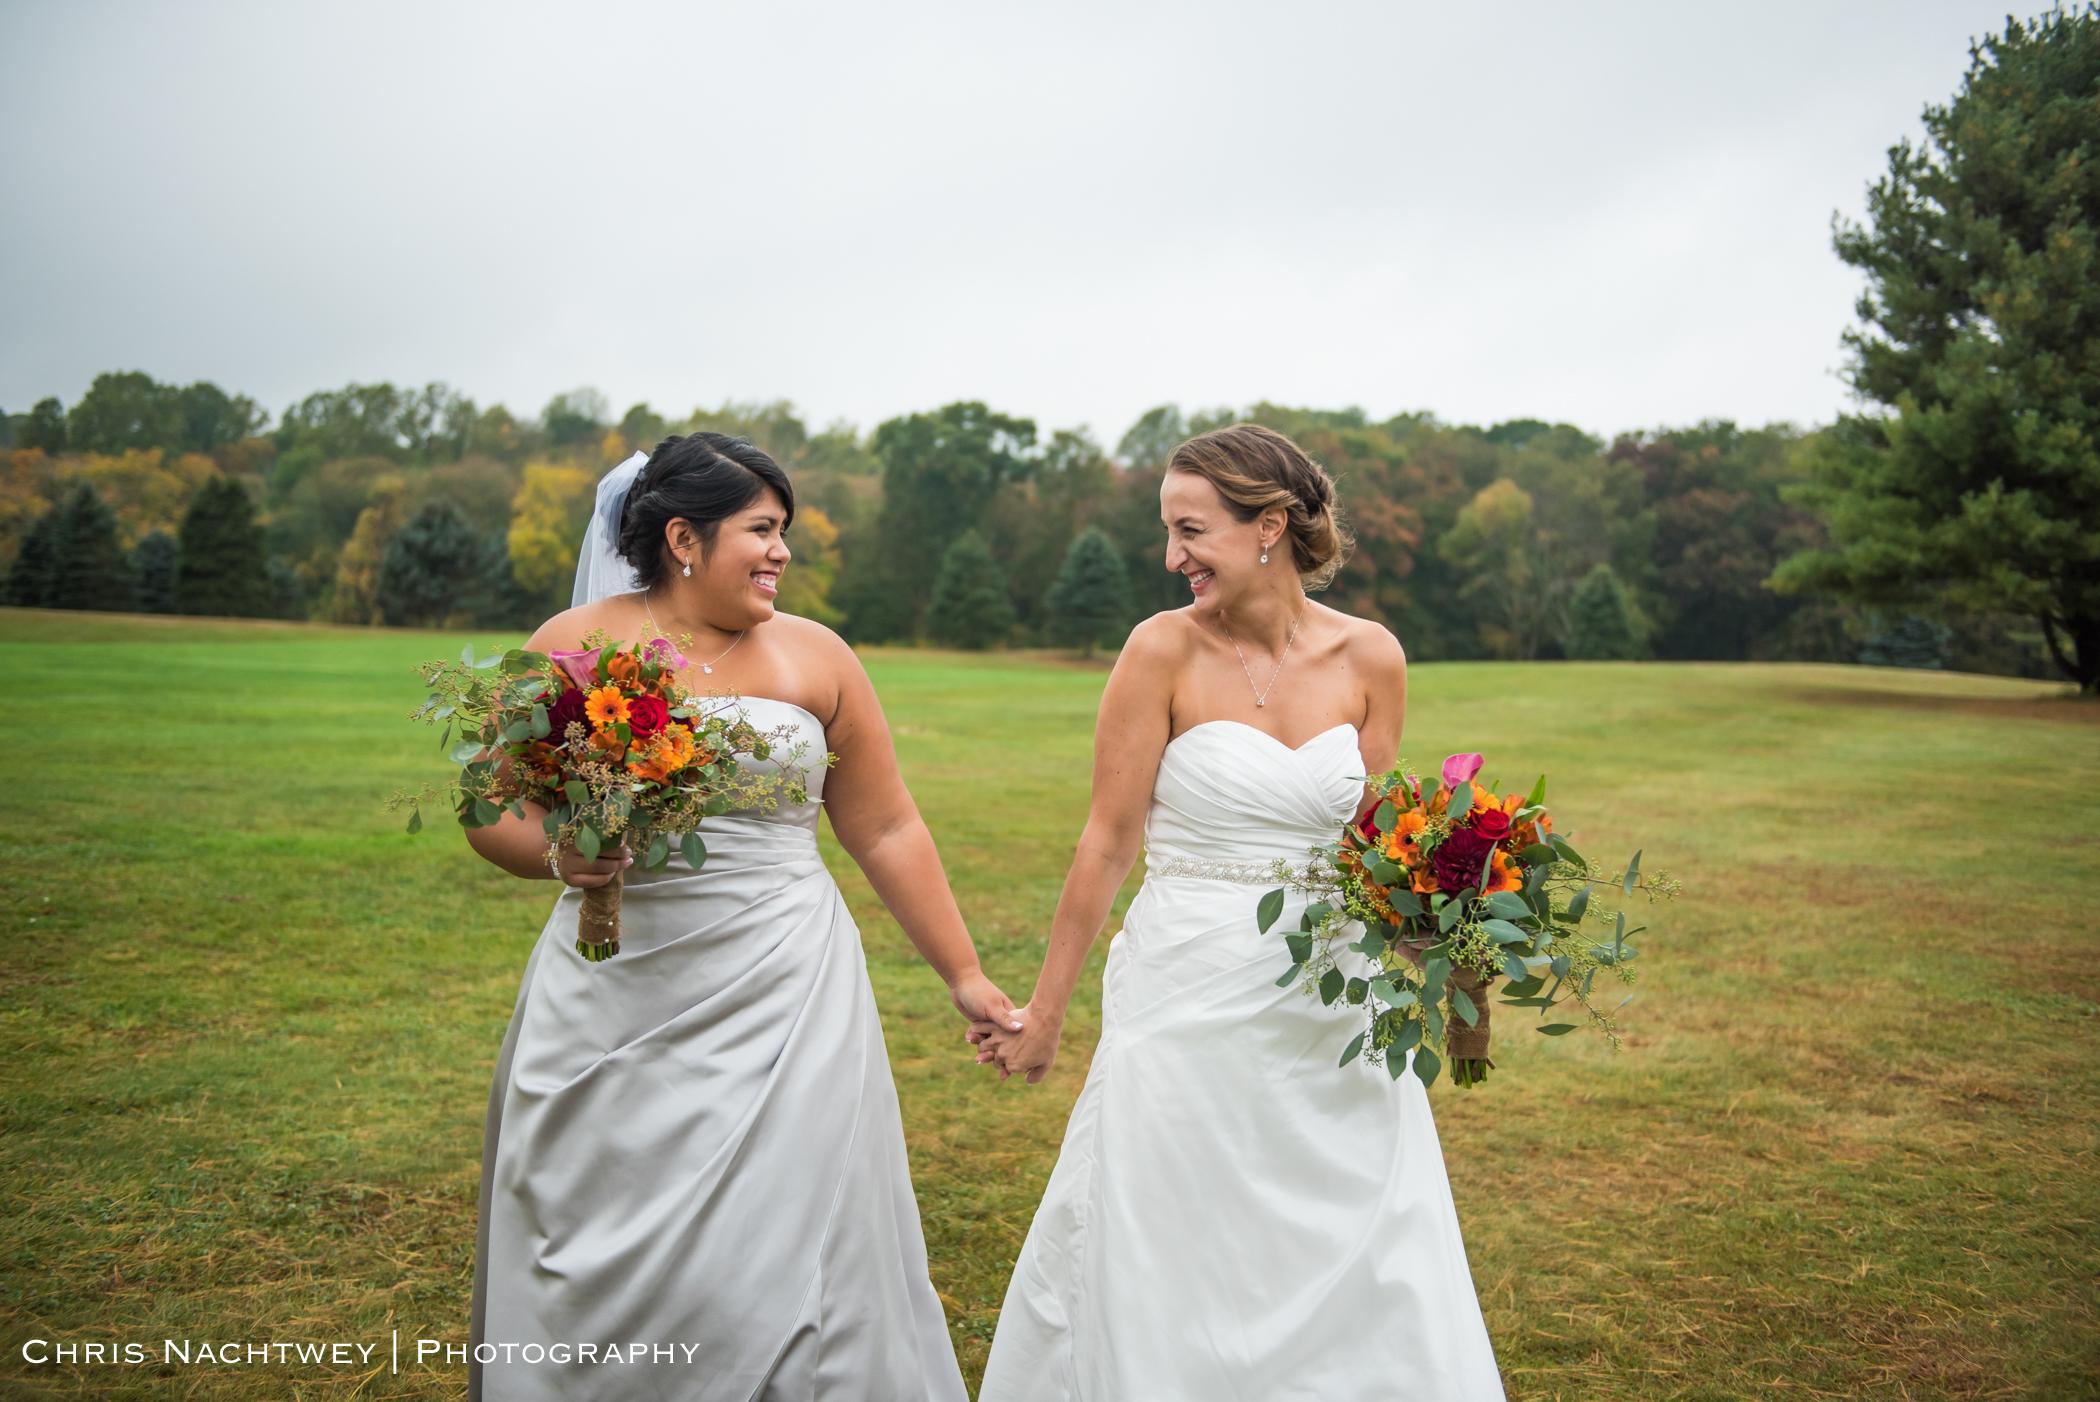 connecticut-same-sex-wedding-photographers-chris-nachtwey-2018-lisa-karina-11.jpg